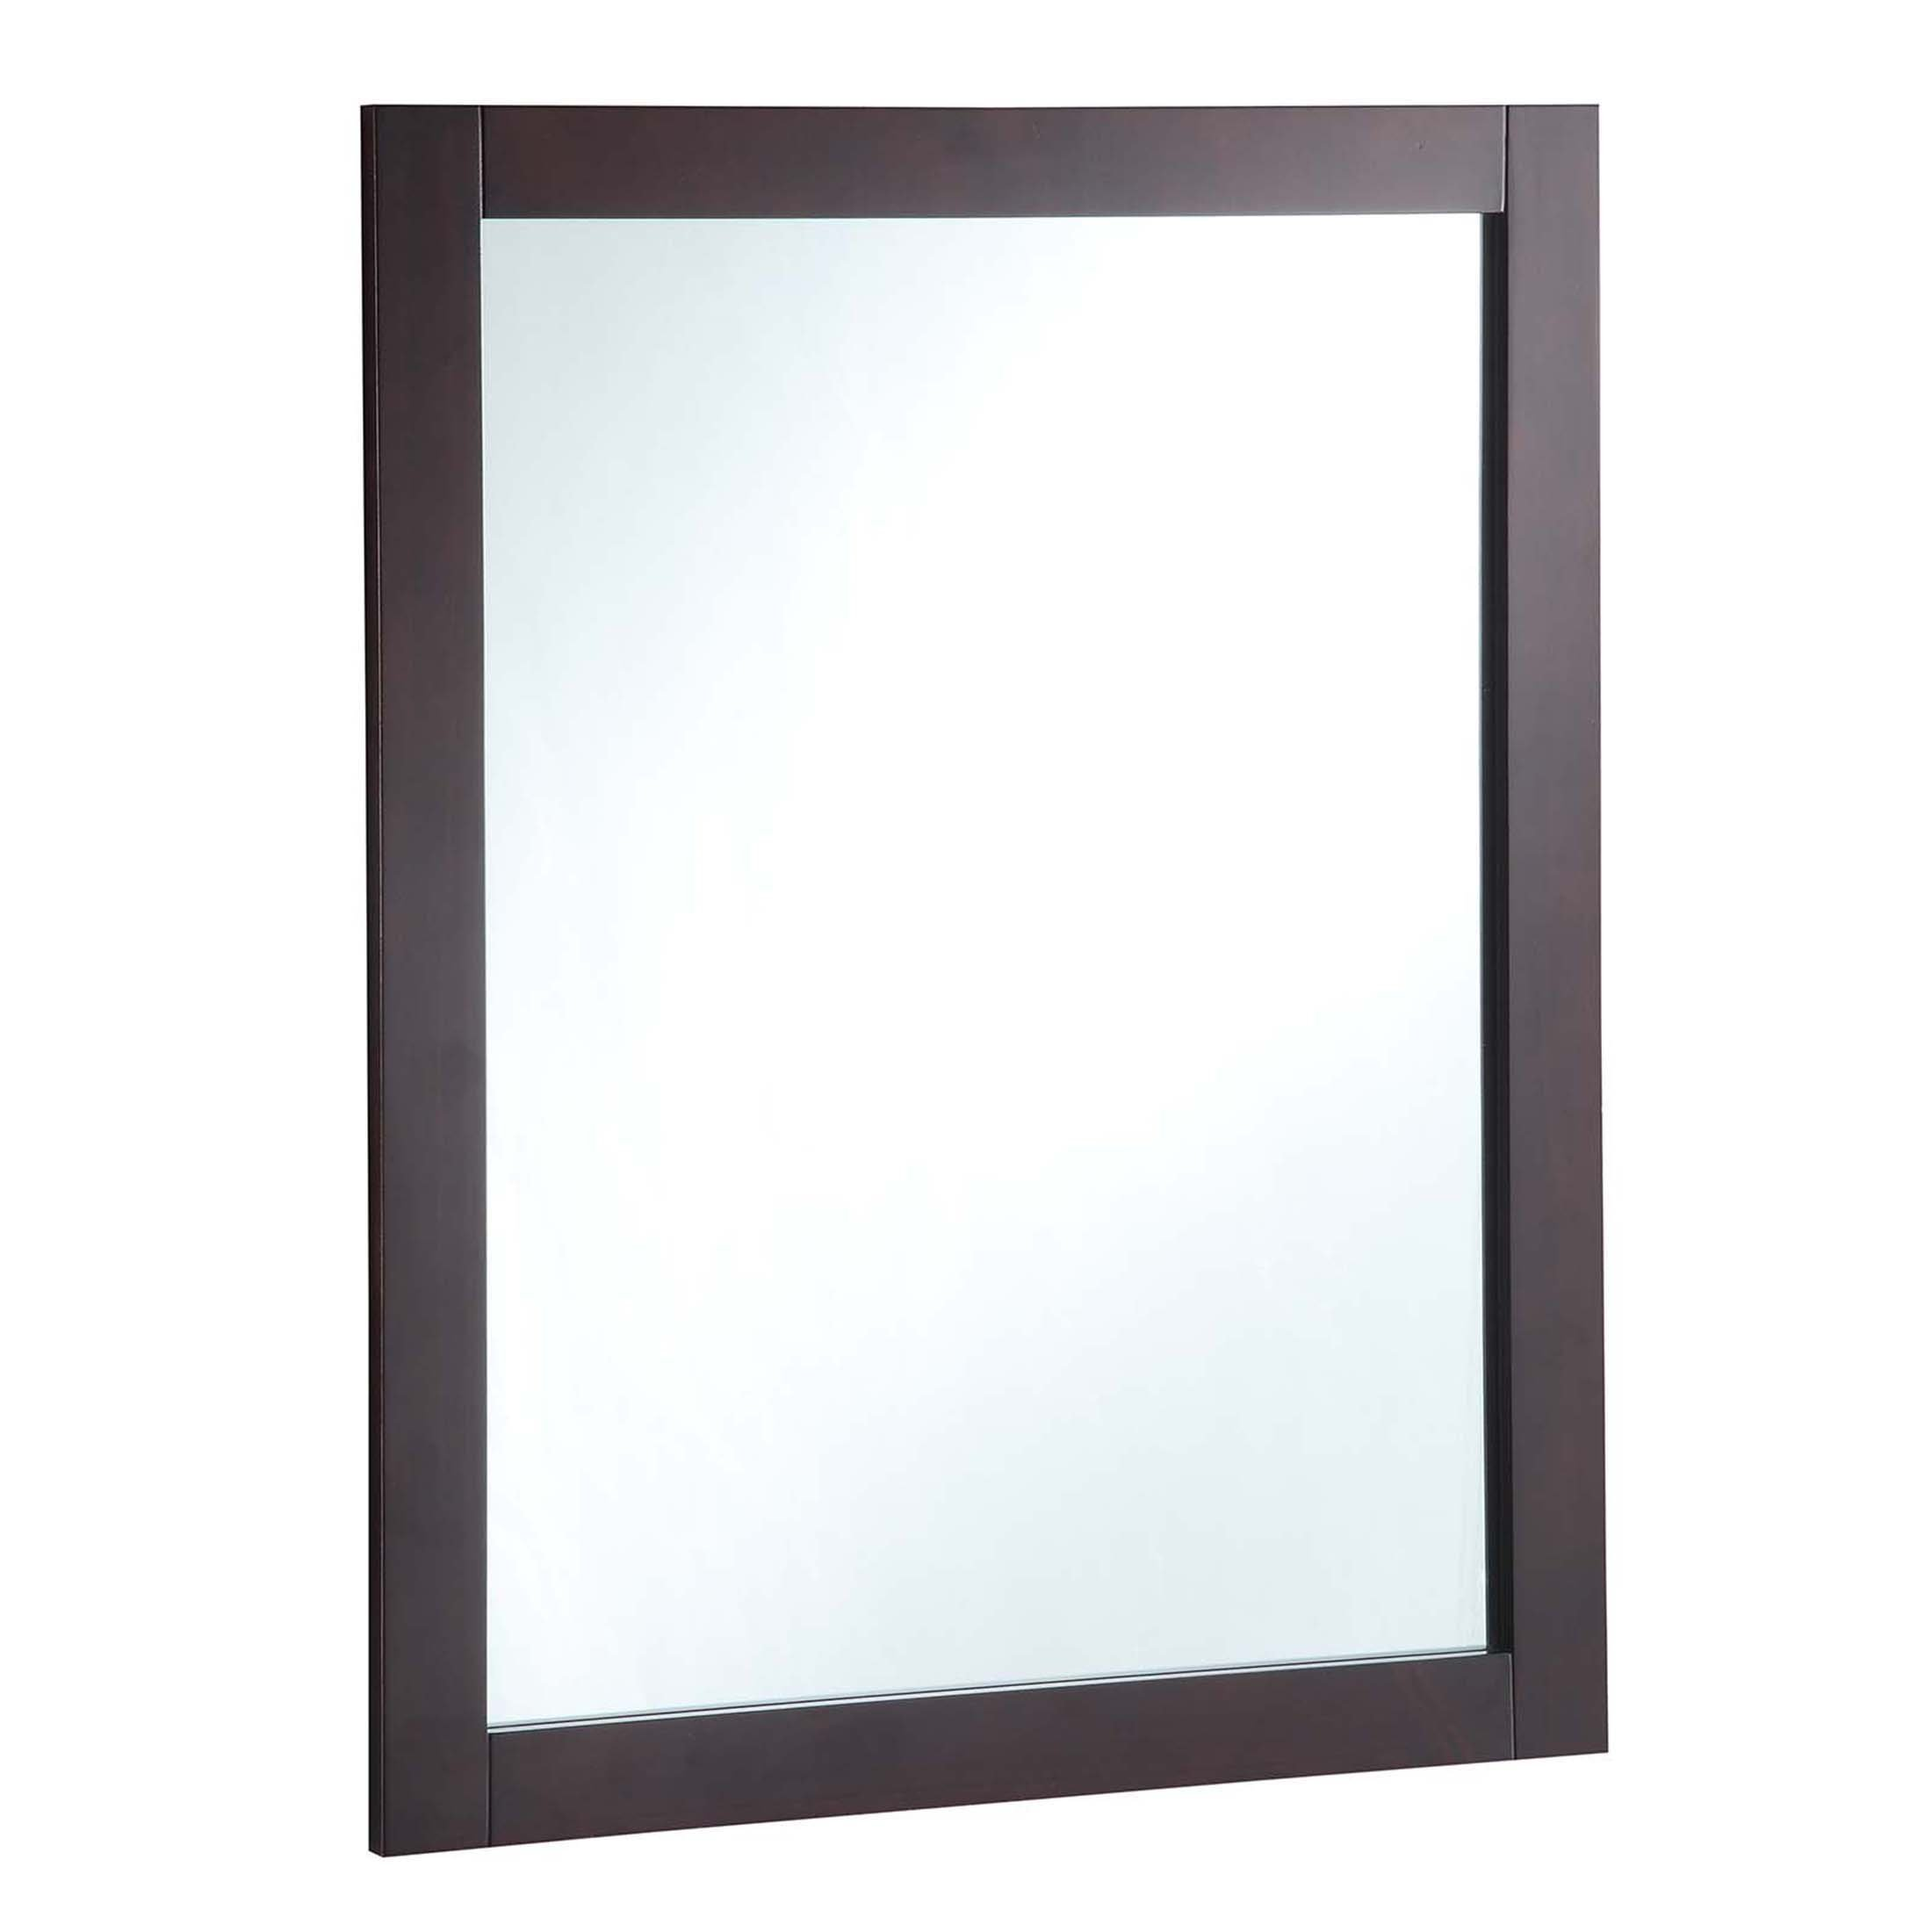 Design House 547083 24'' by 30'' Vanity Mirror, Espresso